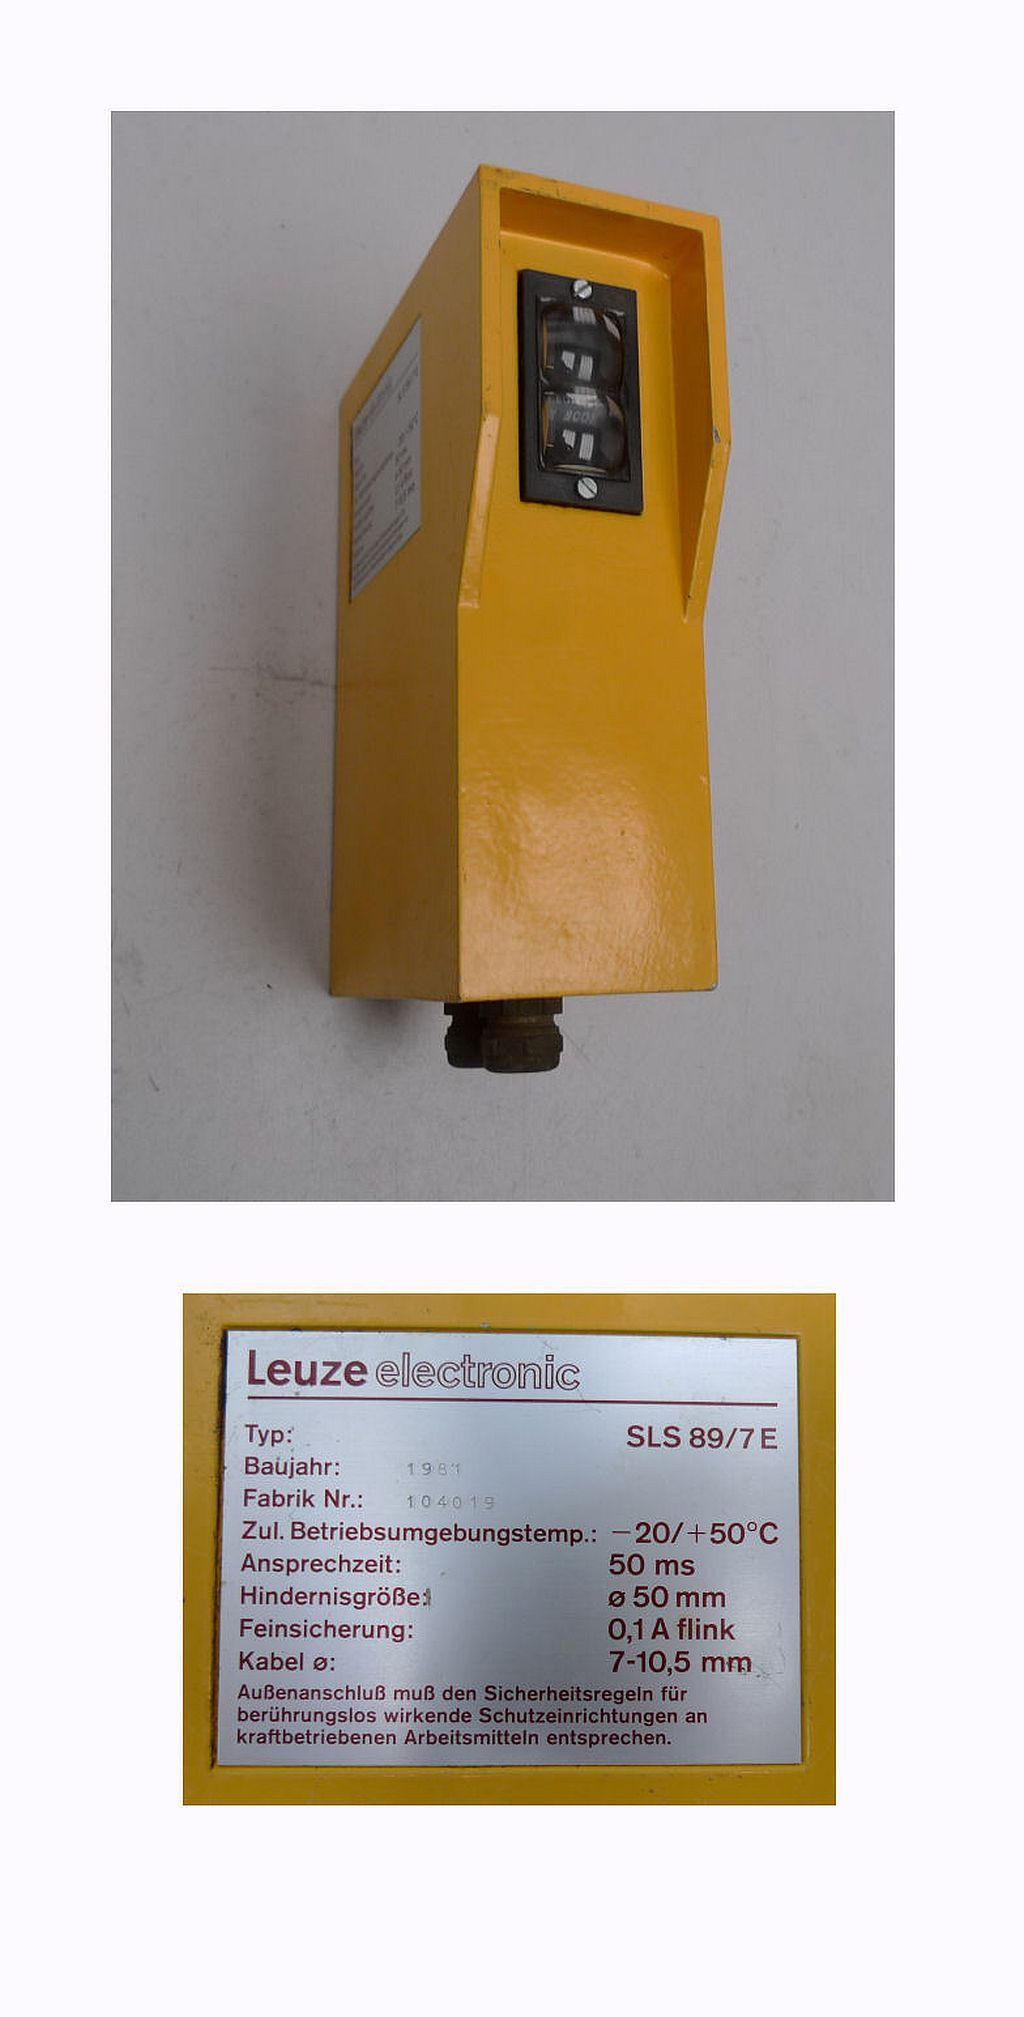 Leuze SLS 89/7 E sls89 104019 Lichtschranke